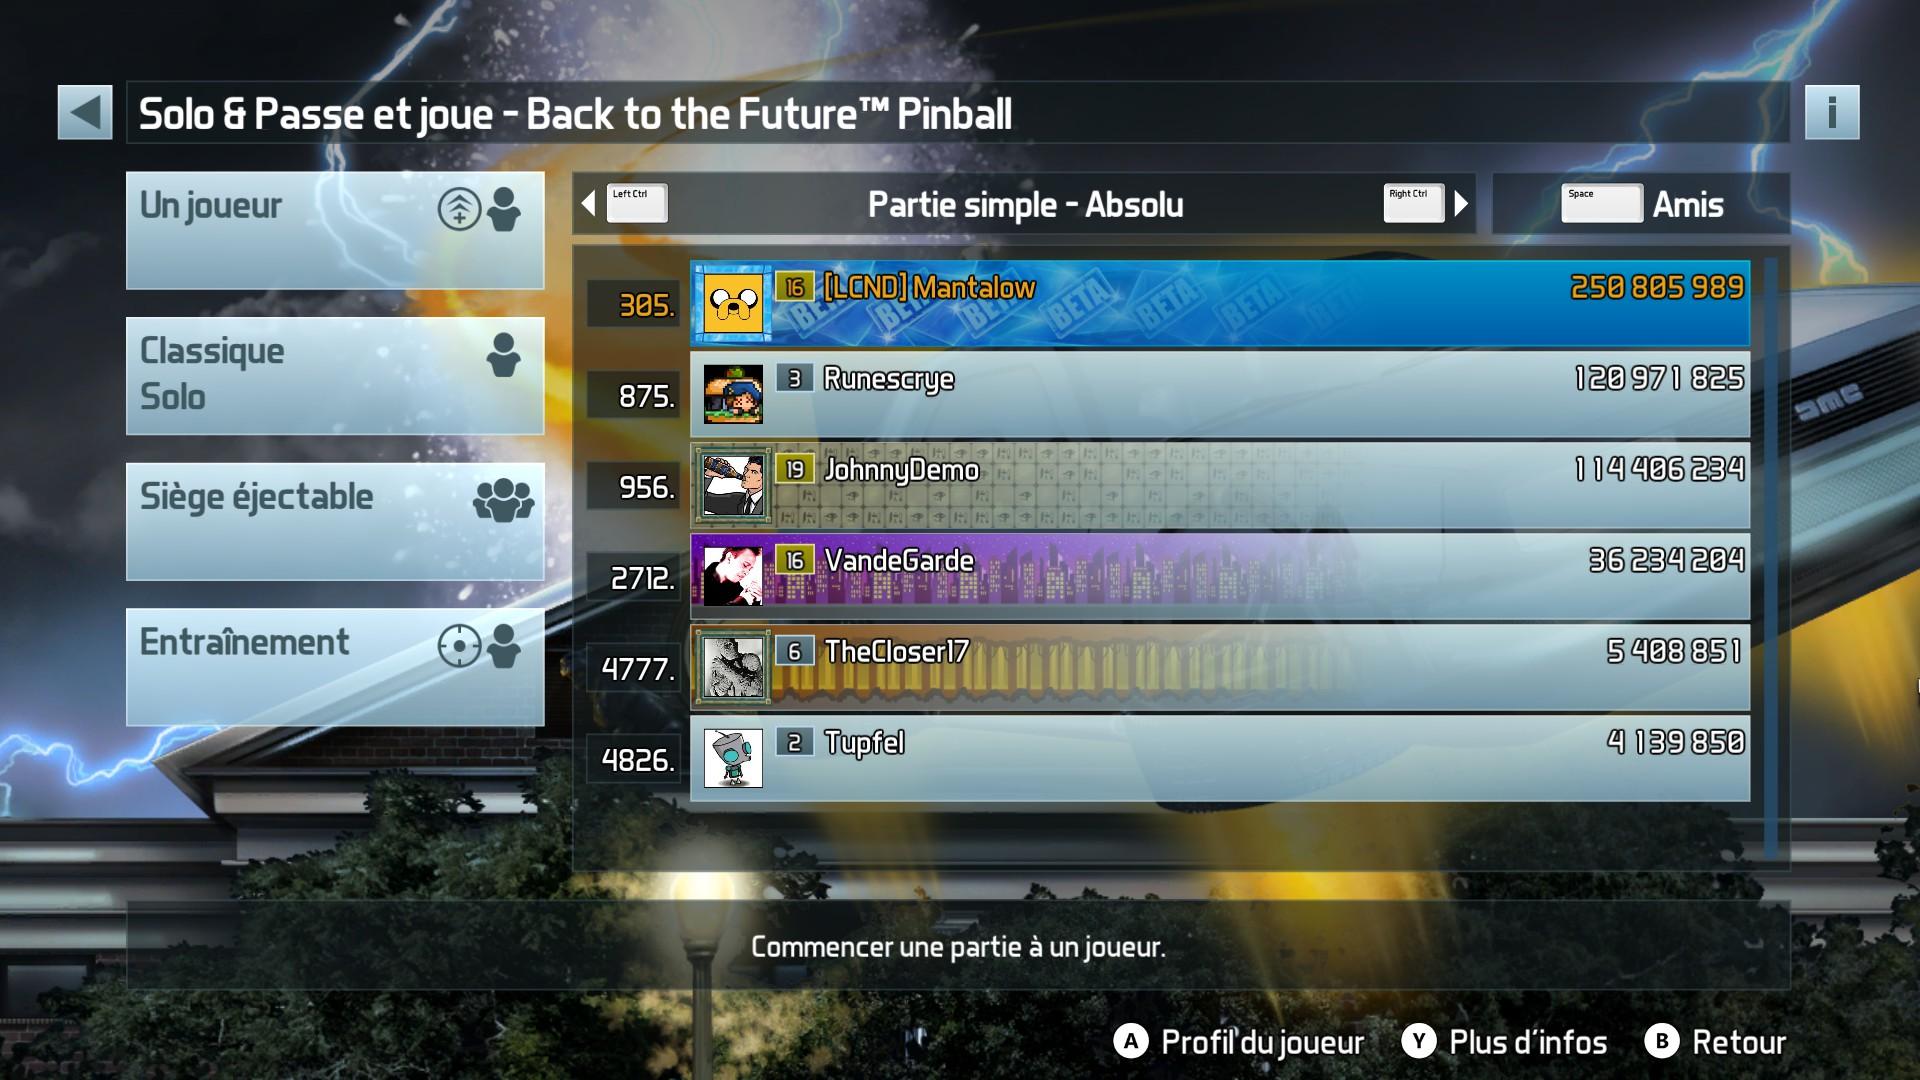 Mantalow: Pinball FX3: Back to the Future Pinball (PC) 250,805,989 points on 2017-10-02 11:35:01